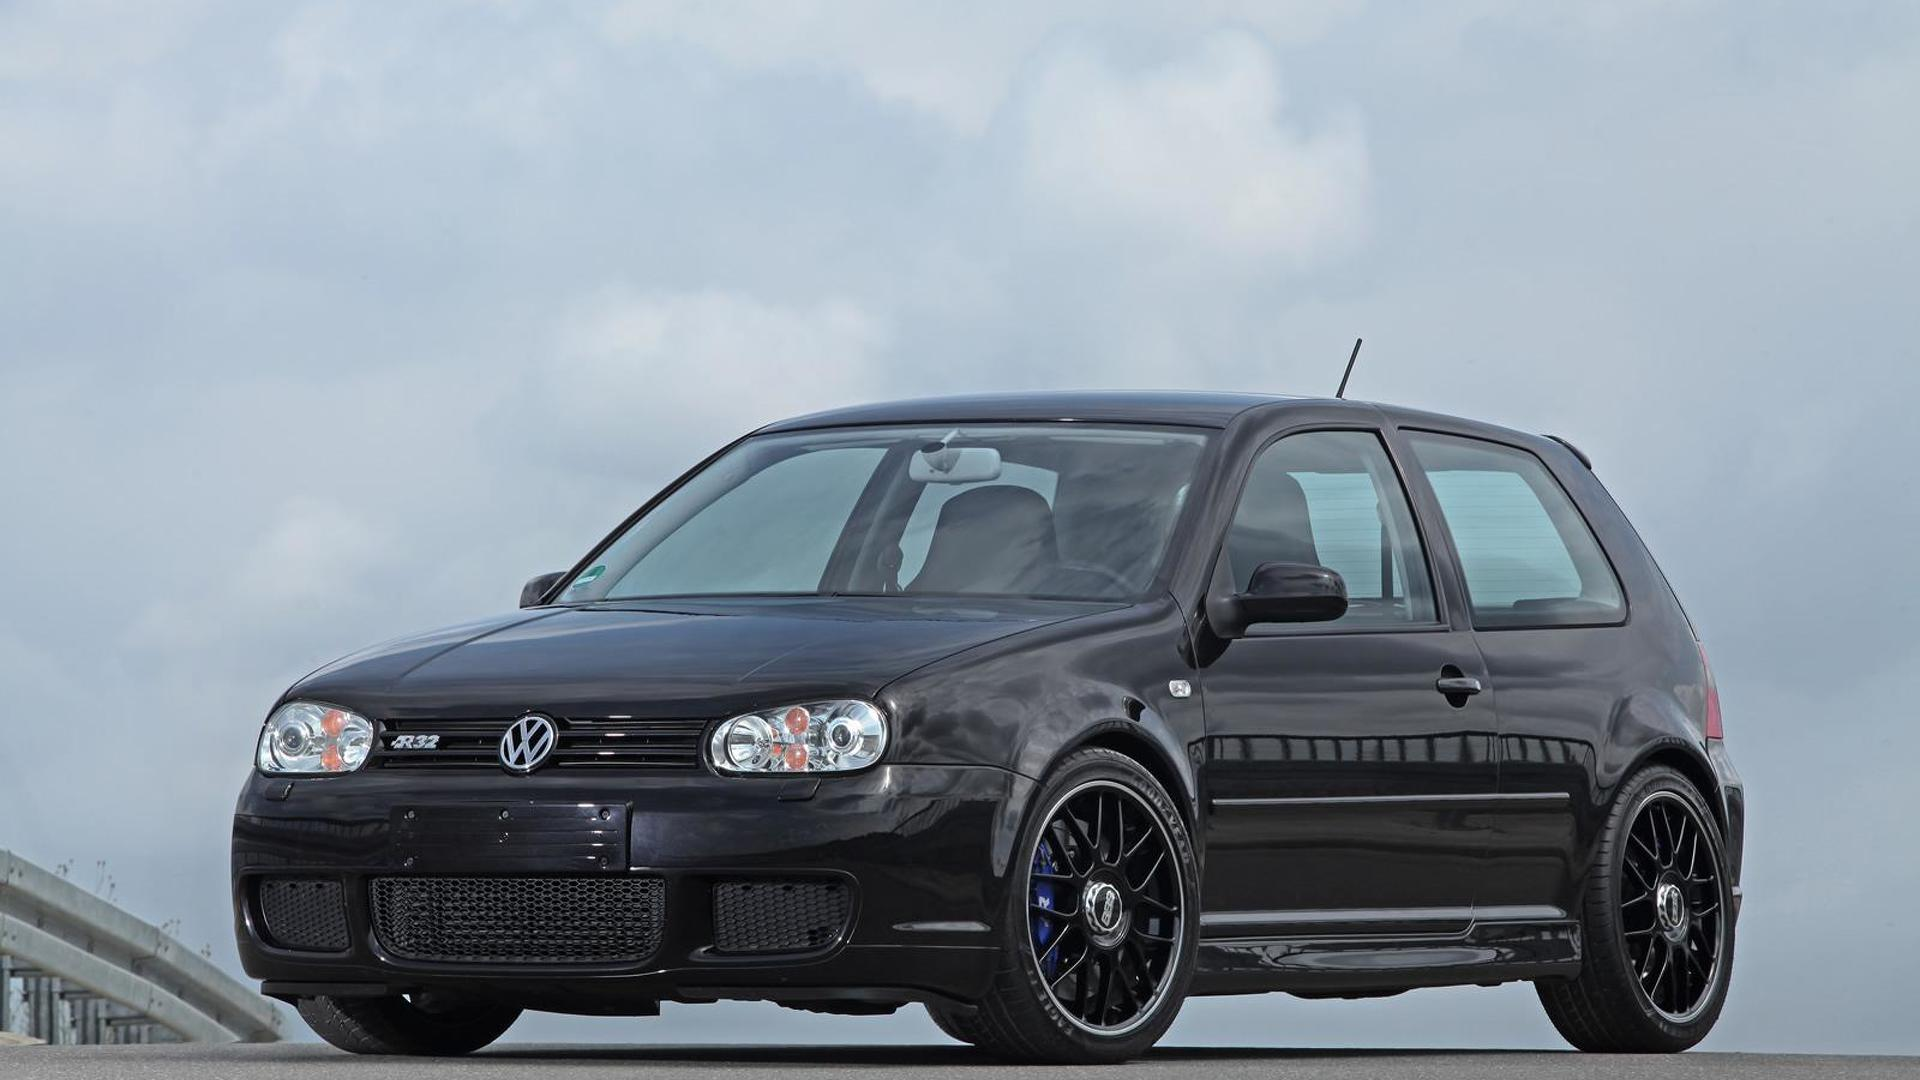 Чёрный Volkswagen Golf IV R32. Тюнинг от HPerformance